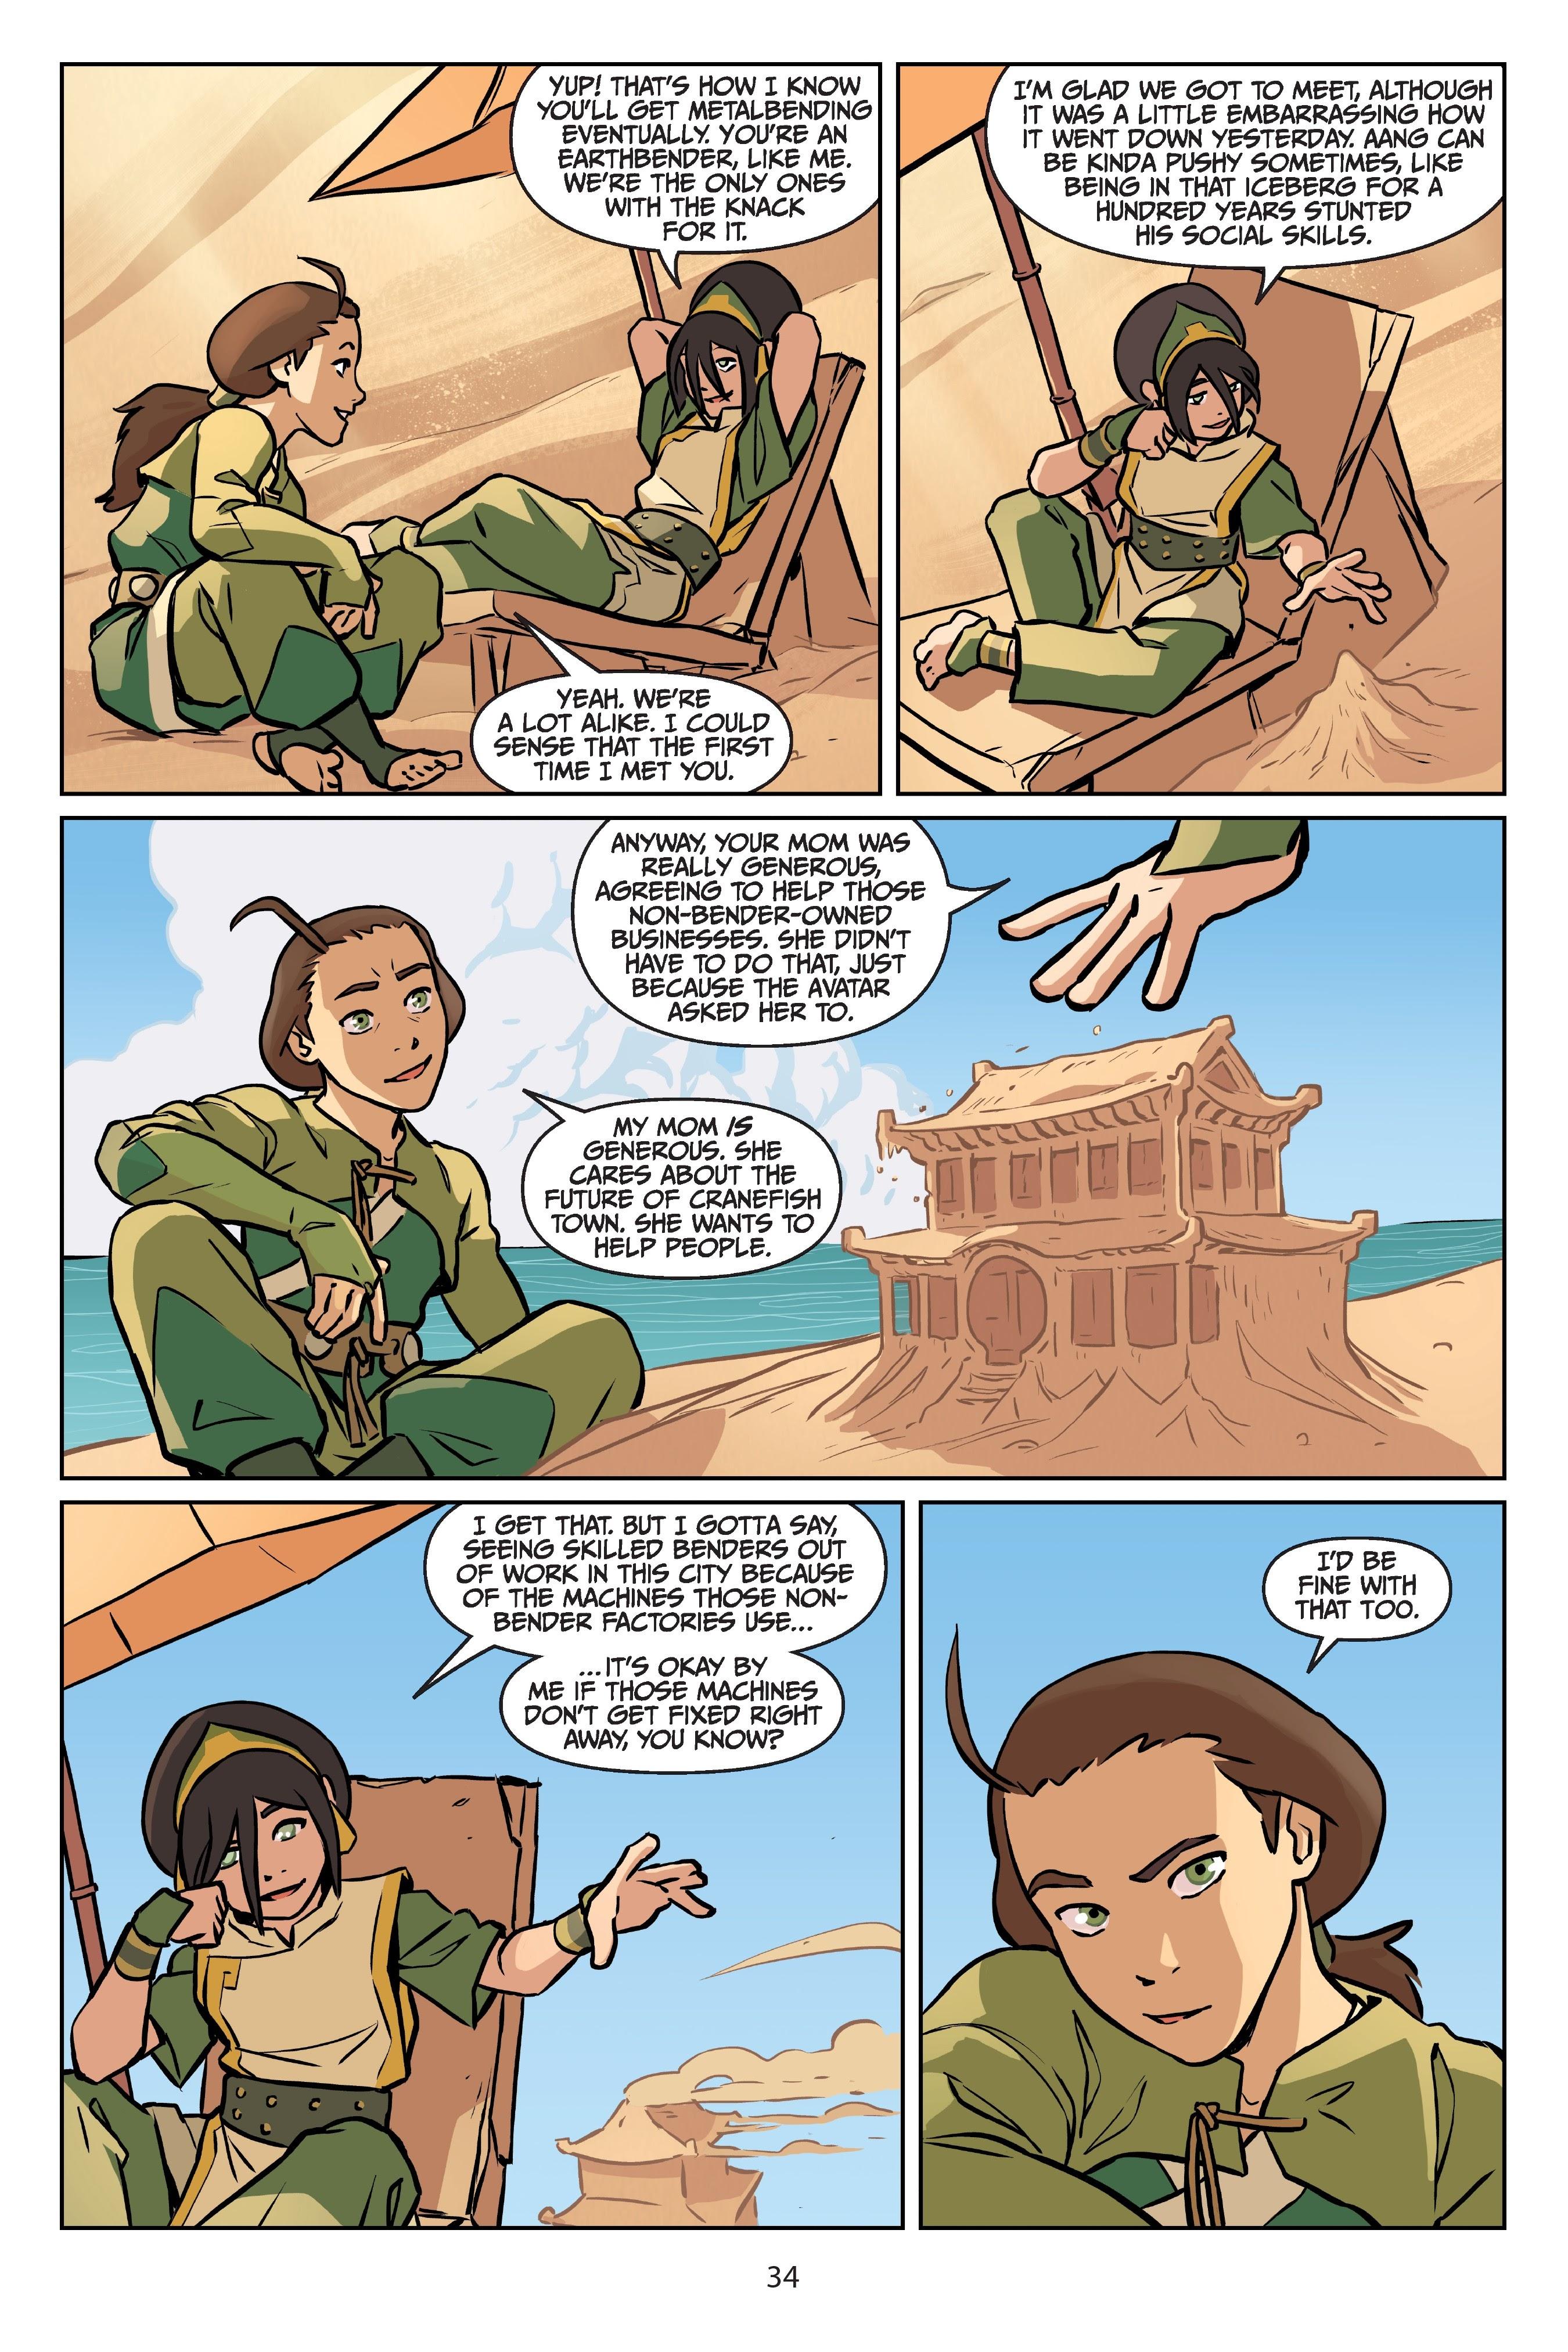 Nickelodeon Avatar: The Last Airbender - Imbalance TPB_2 Page 34